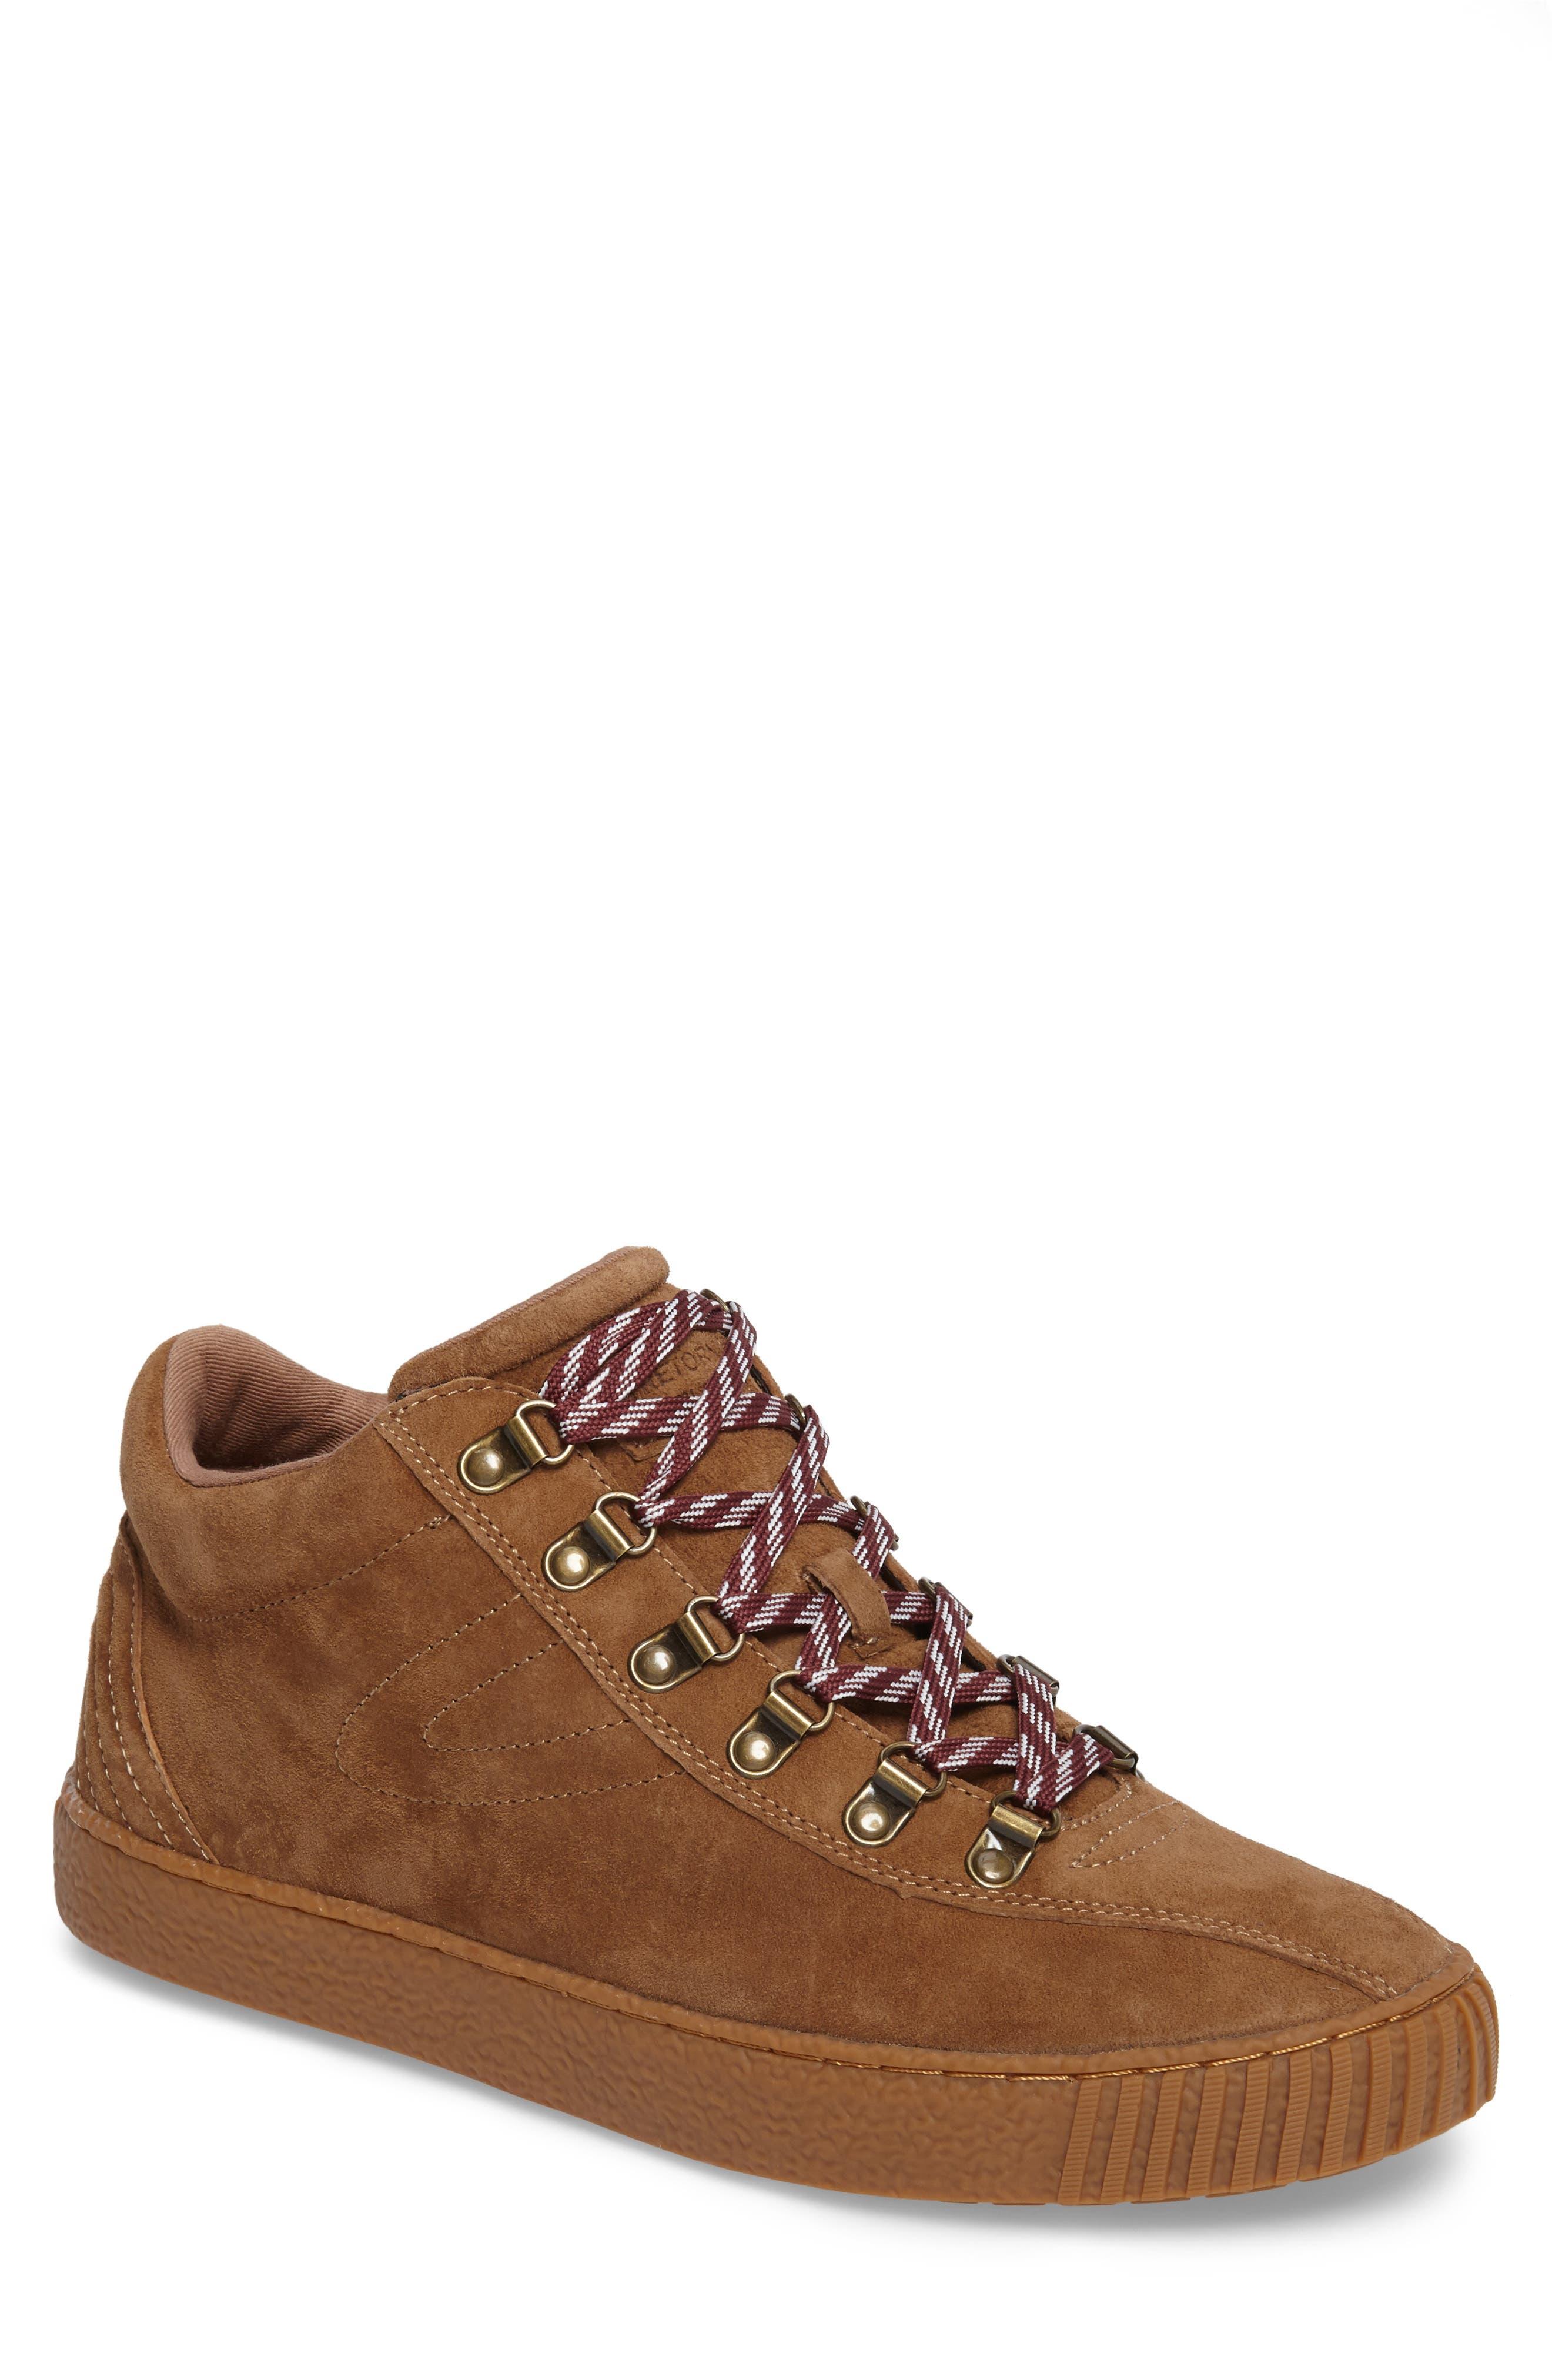 Dante 3 Sneaker,                             Main thumbnail 1, color,                             CIGAR NUBUCK